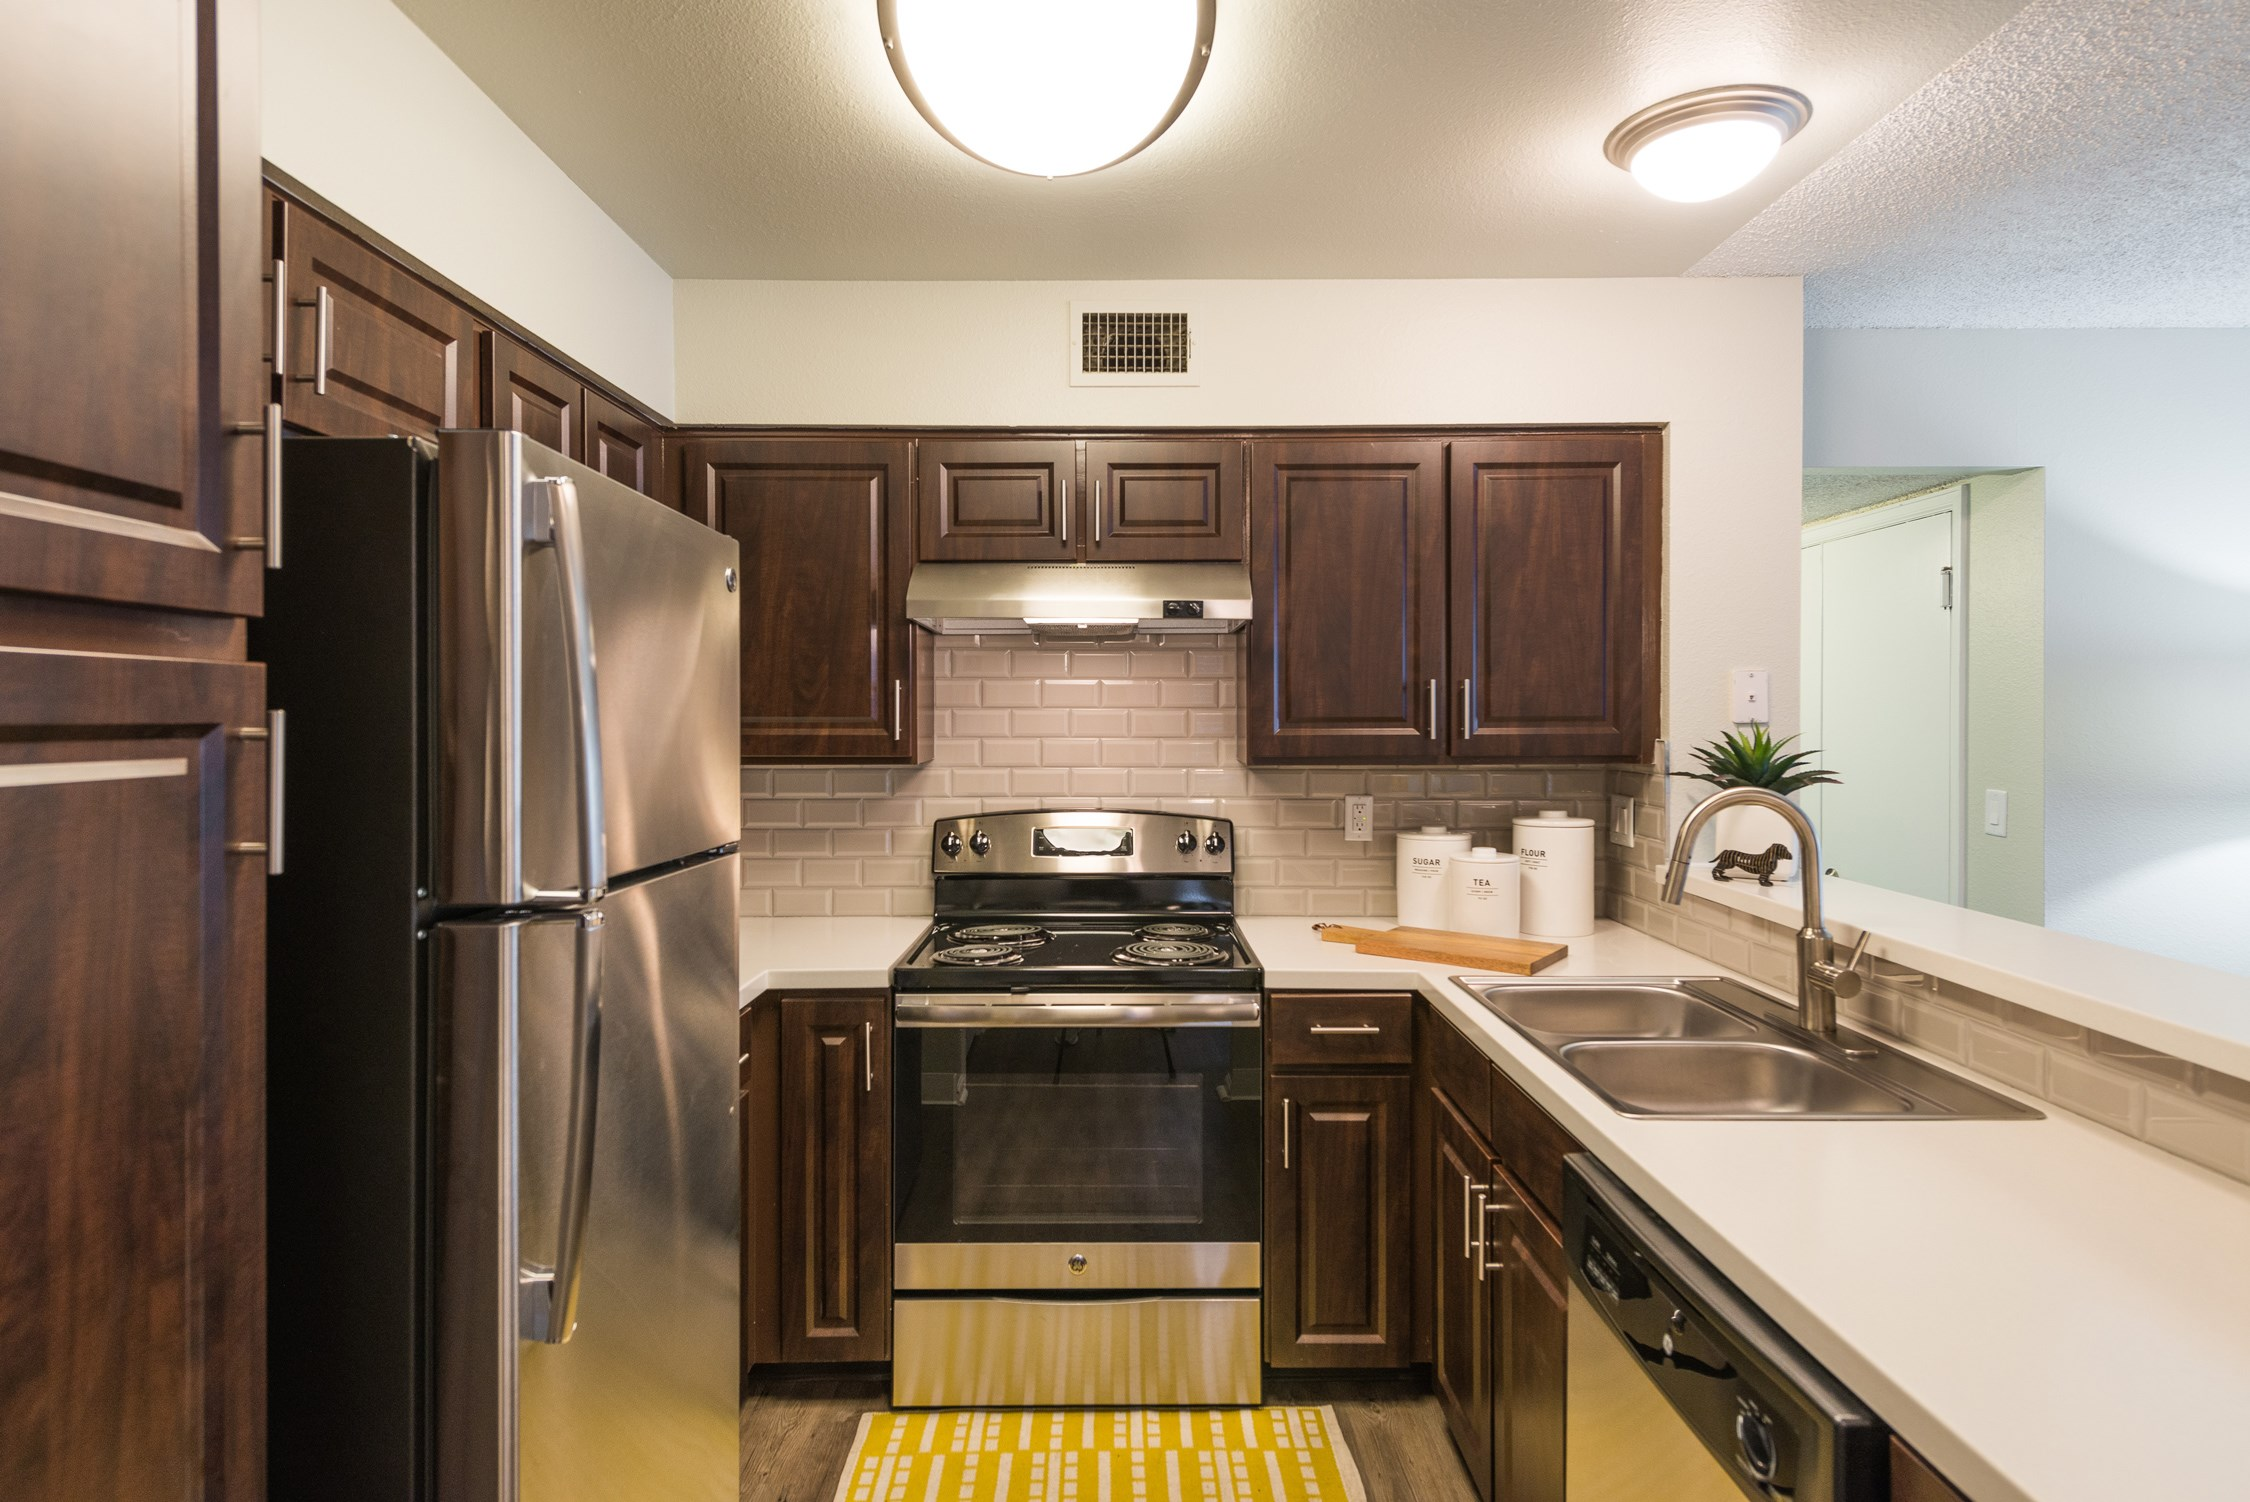 Kitchen at Conifer Creek Apartments in Aurora, IL